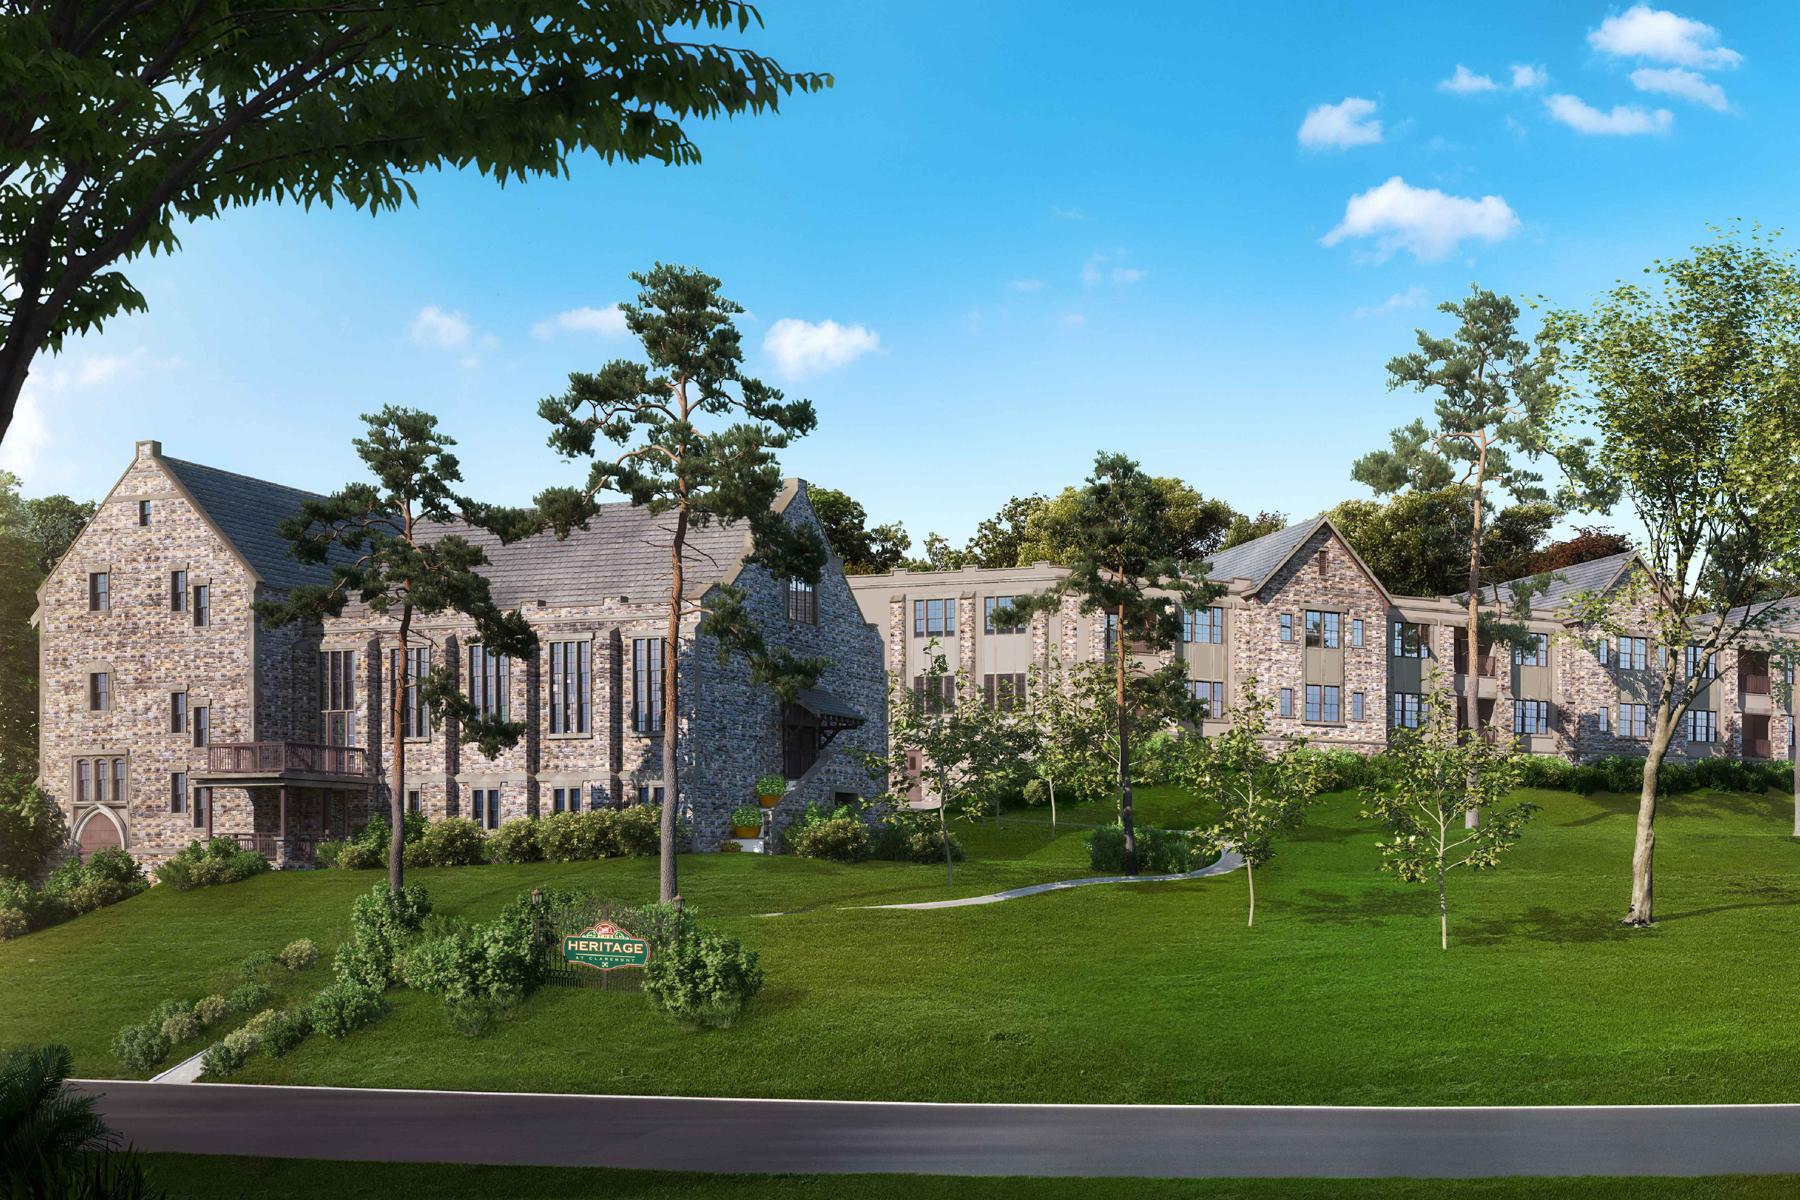 Condominiums للـ Sale في The Heritage at Claremont 80 Claremont Road, Residence 206, Bernardsville, New Jersey 07924 United States